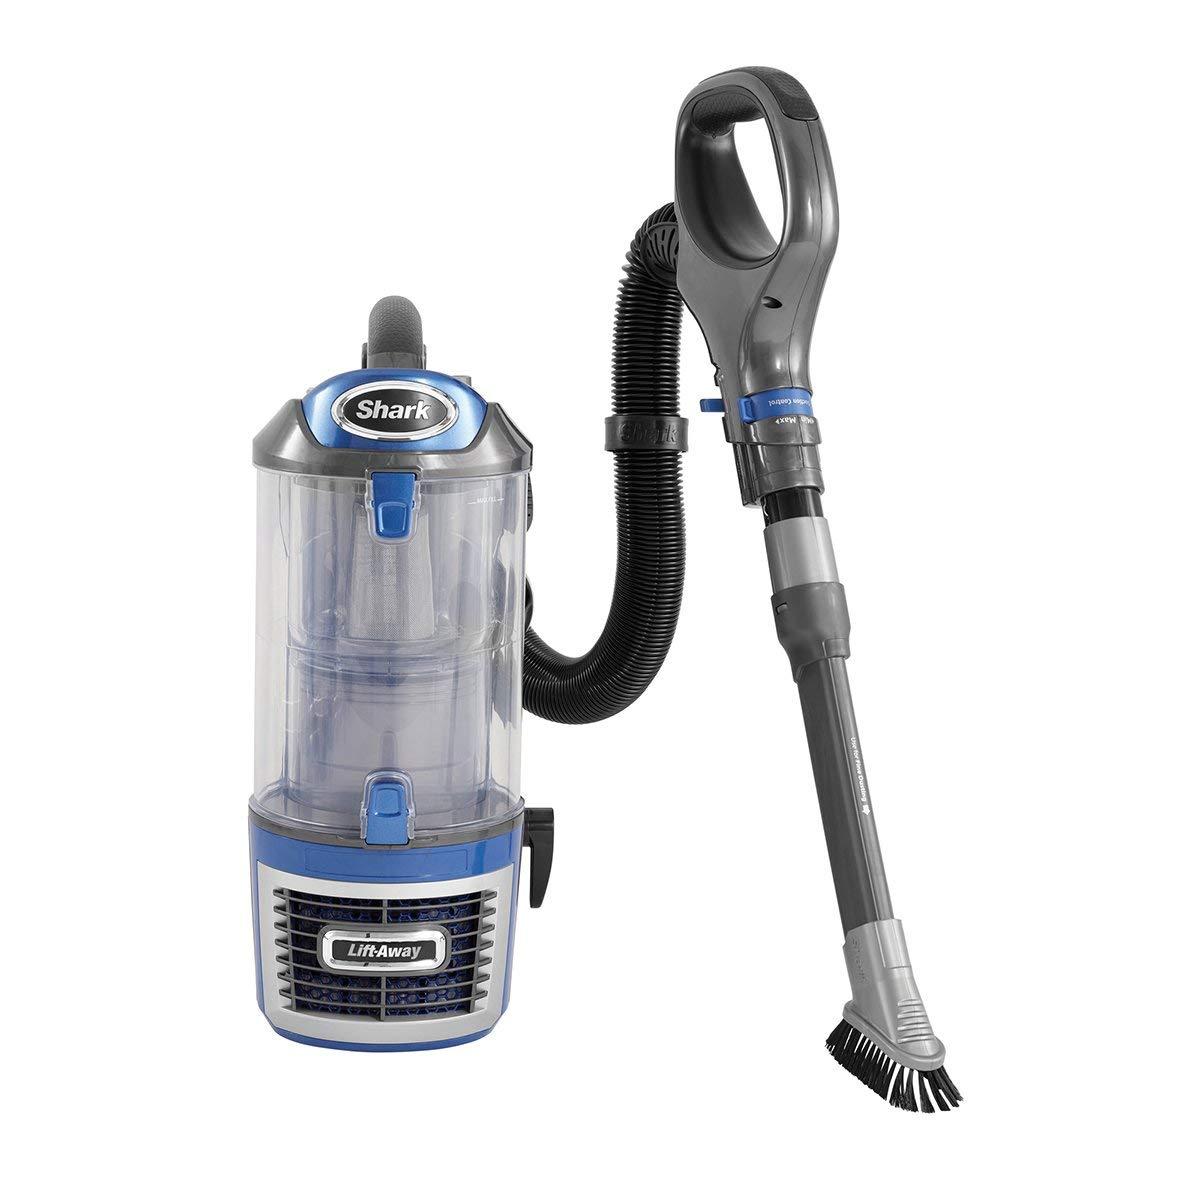 Shark NV601UK Lift-Away Upright Vacuum Cleaner, Blue/Steel Grey £159.99 Amazon